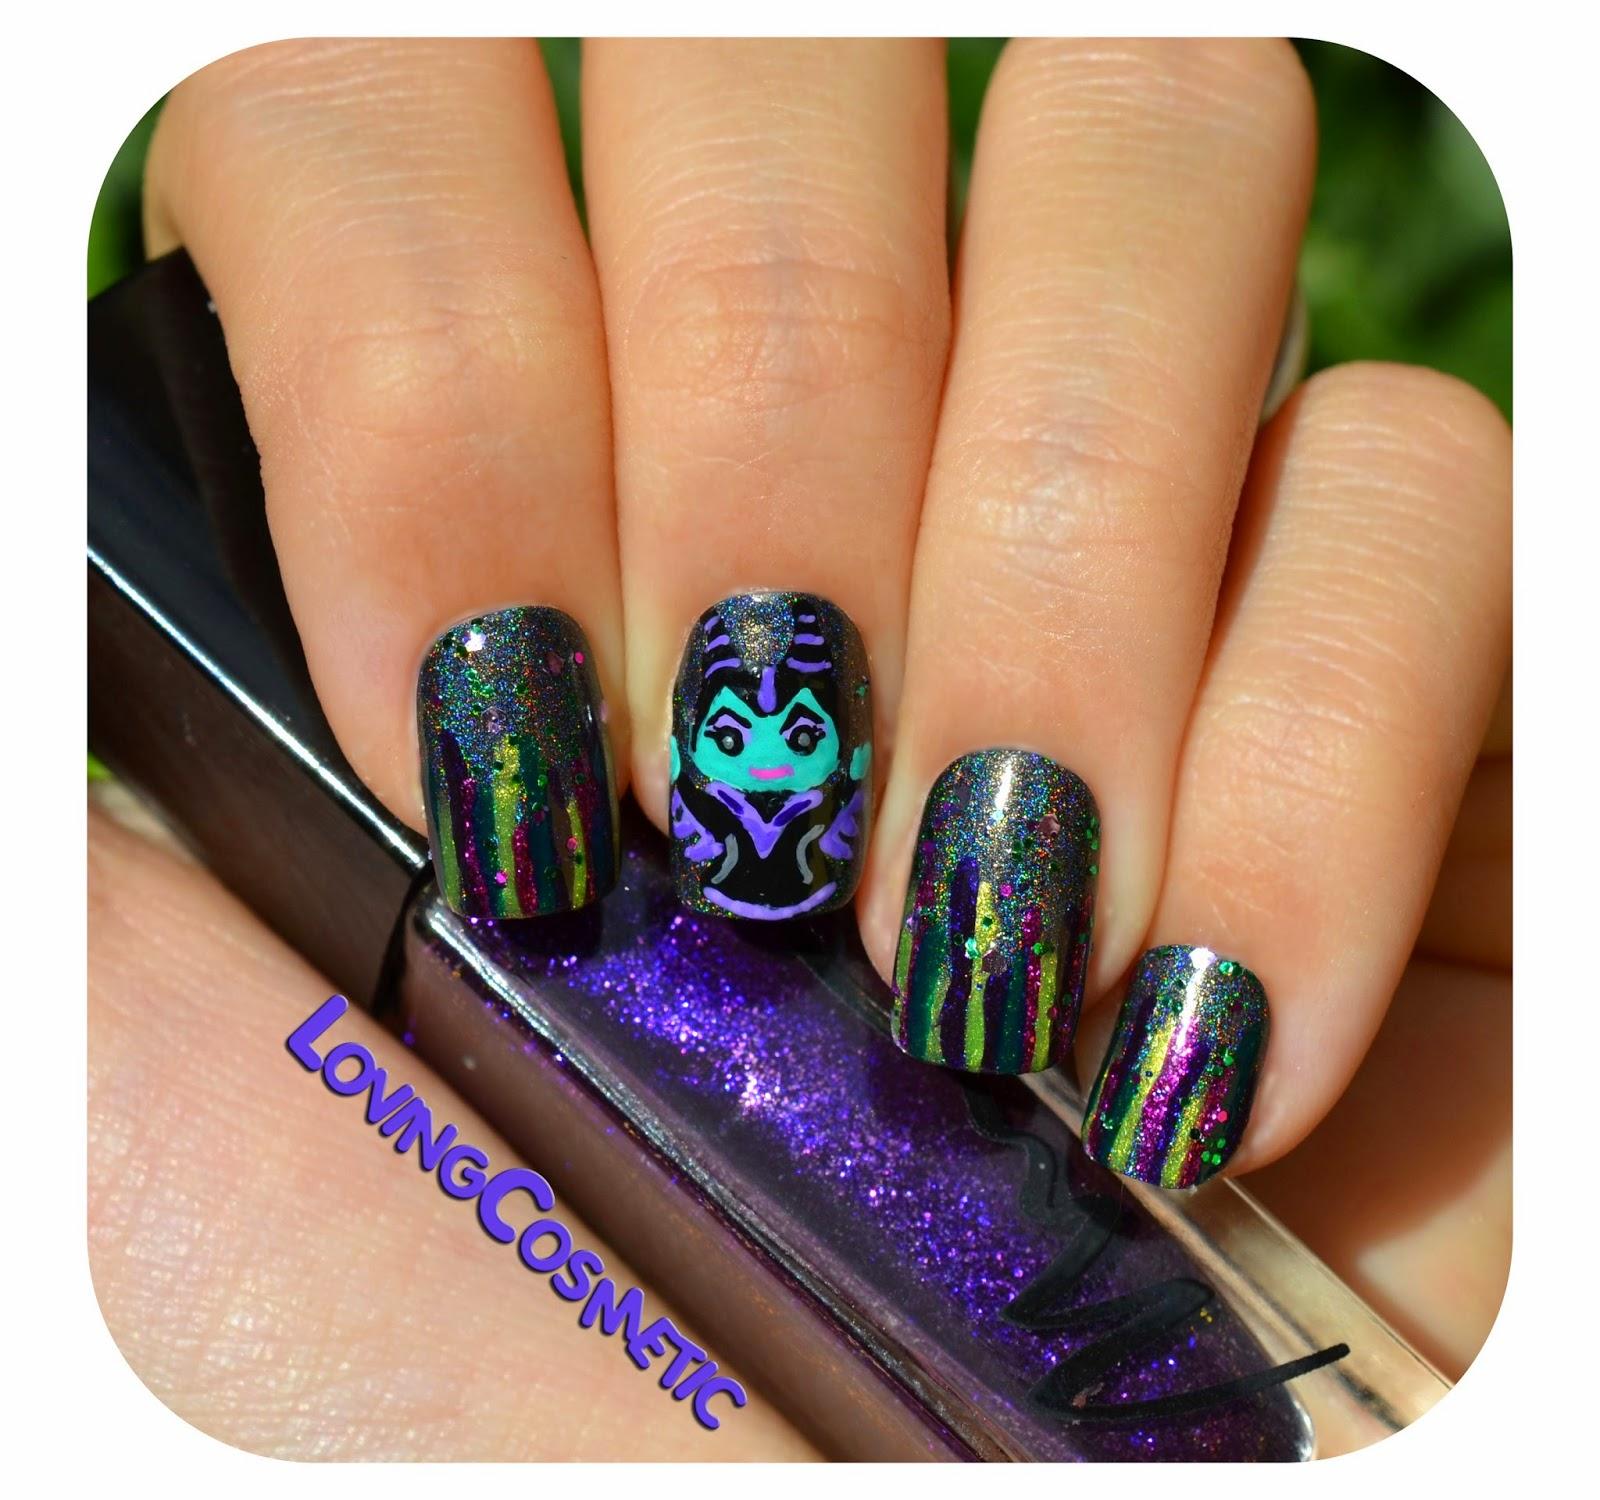 Uñas malefica maléfica maleficent nails nail art marionnaud esmalte uña kawaii